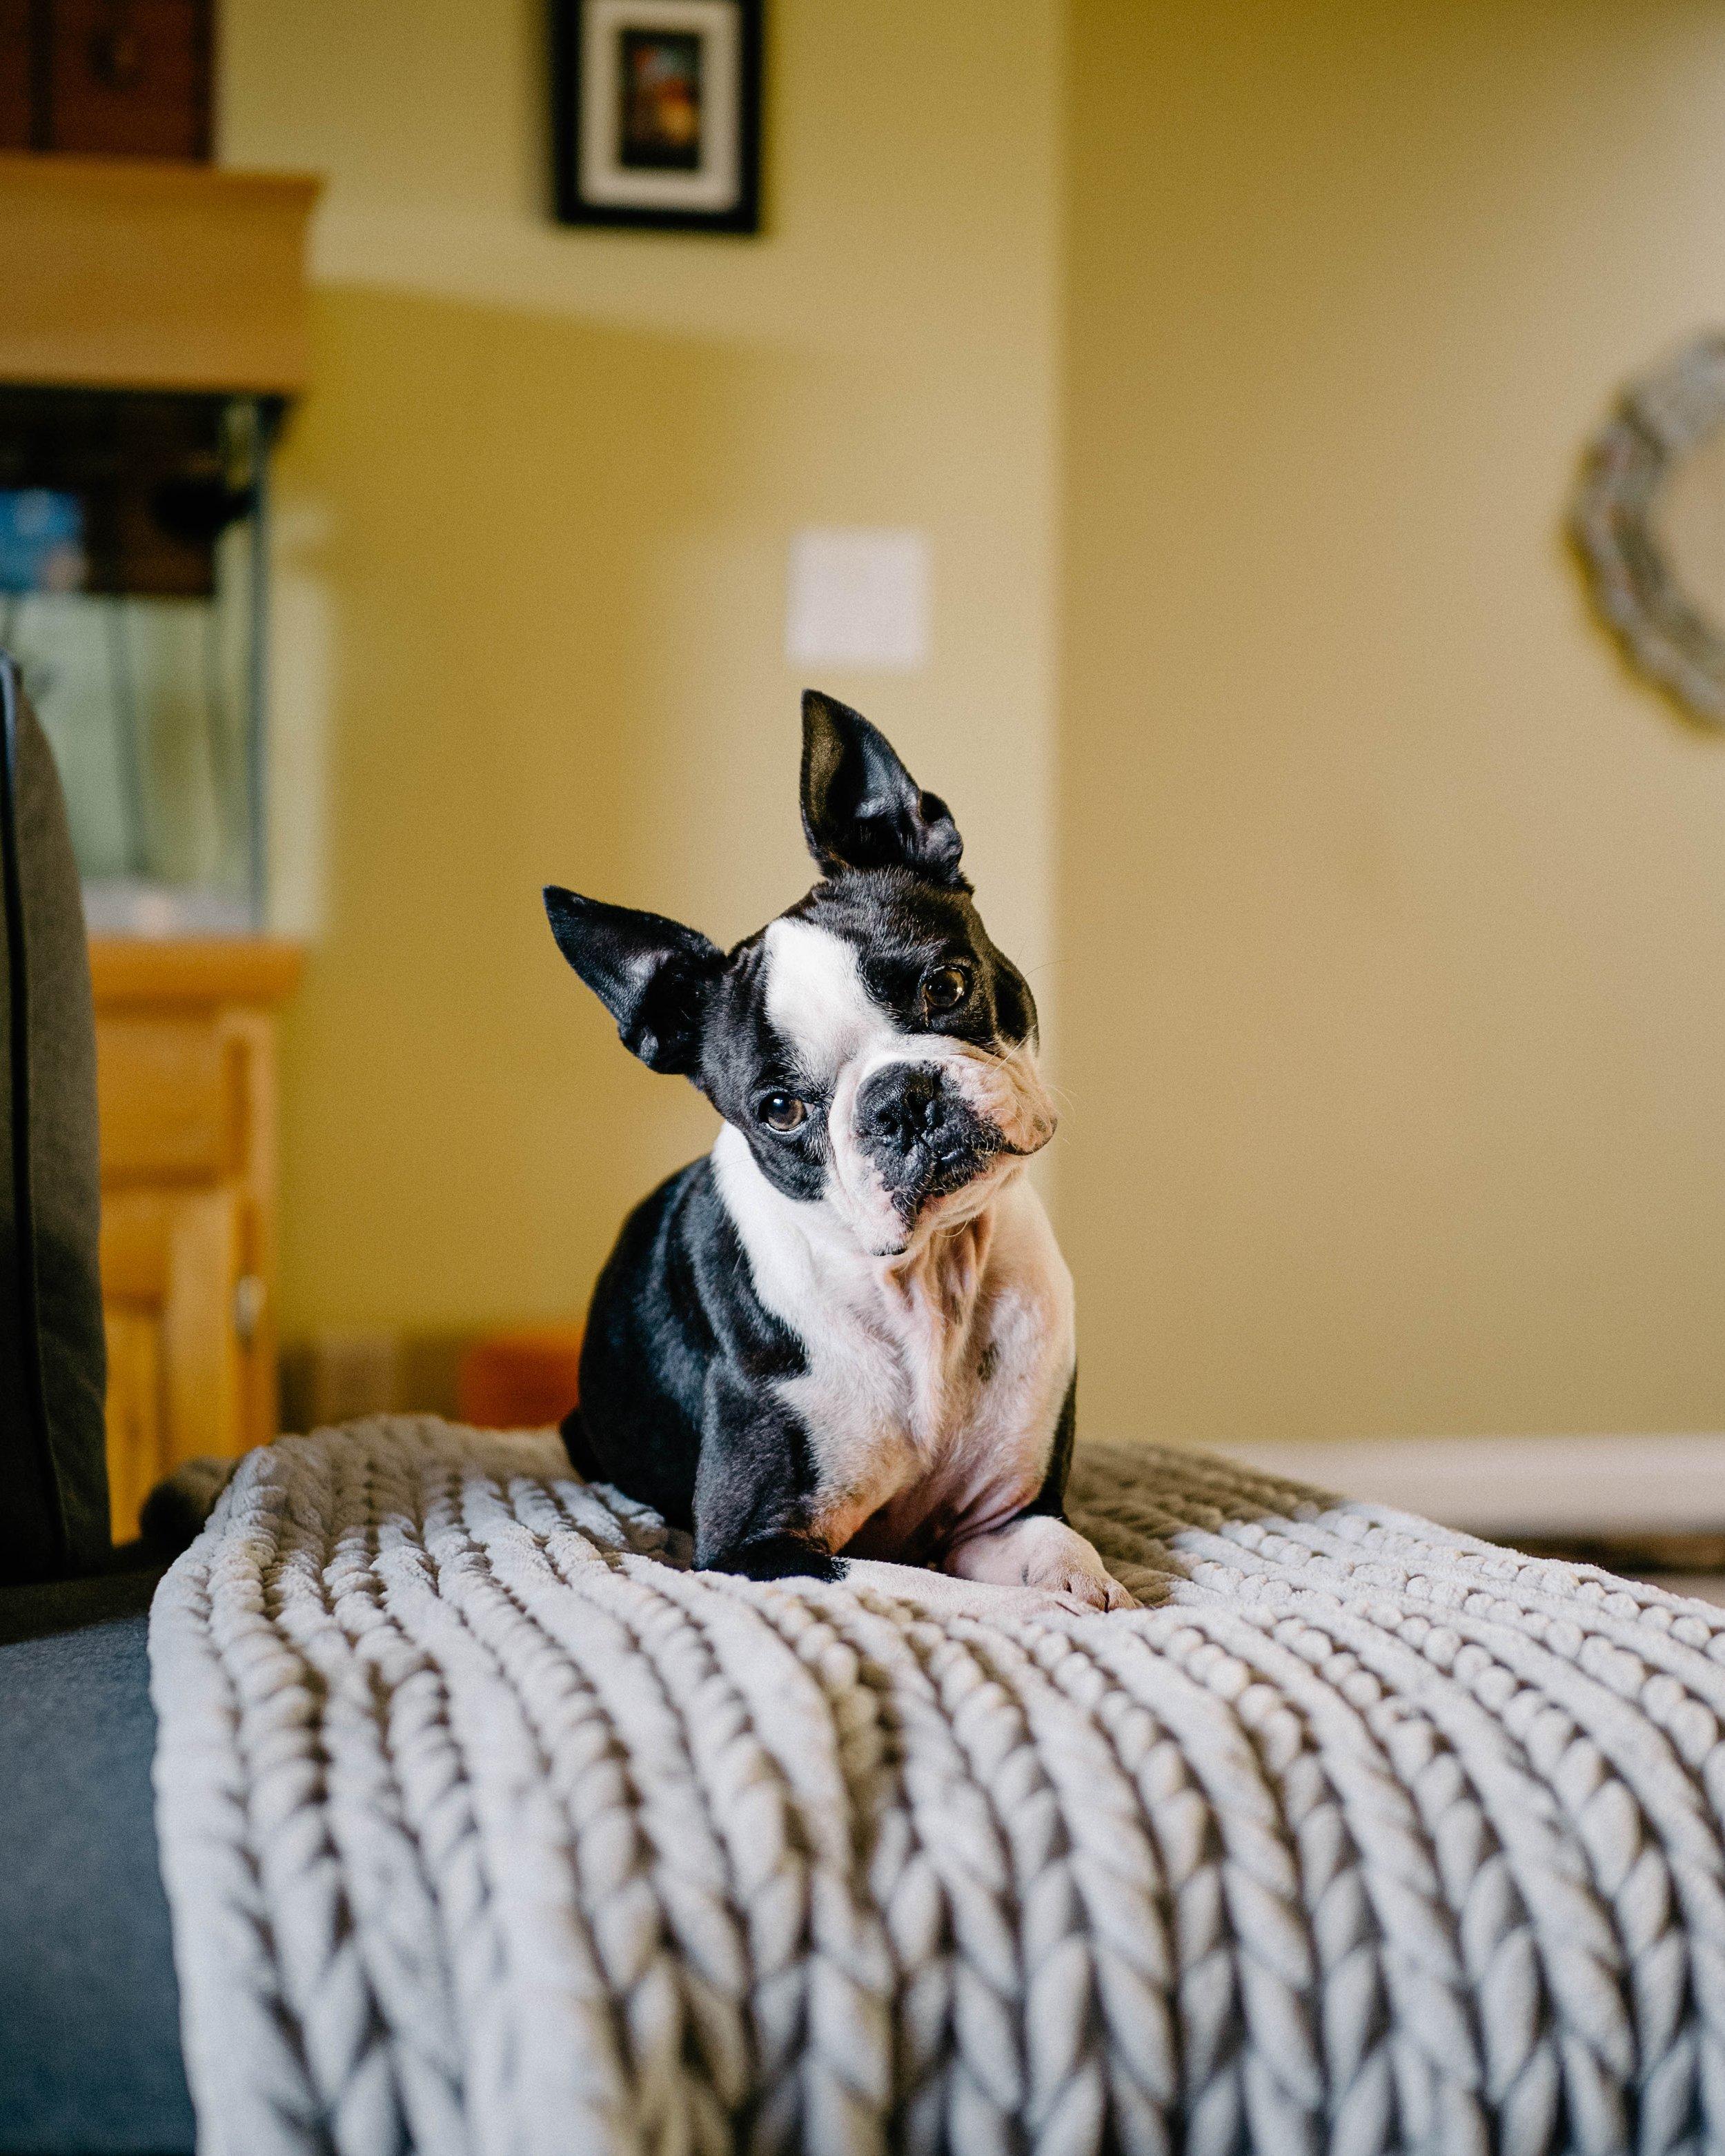 Puppy on couch.jpg